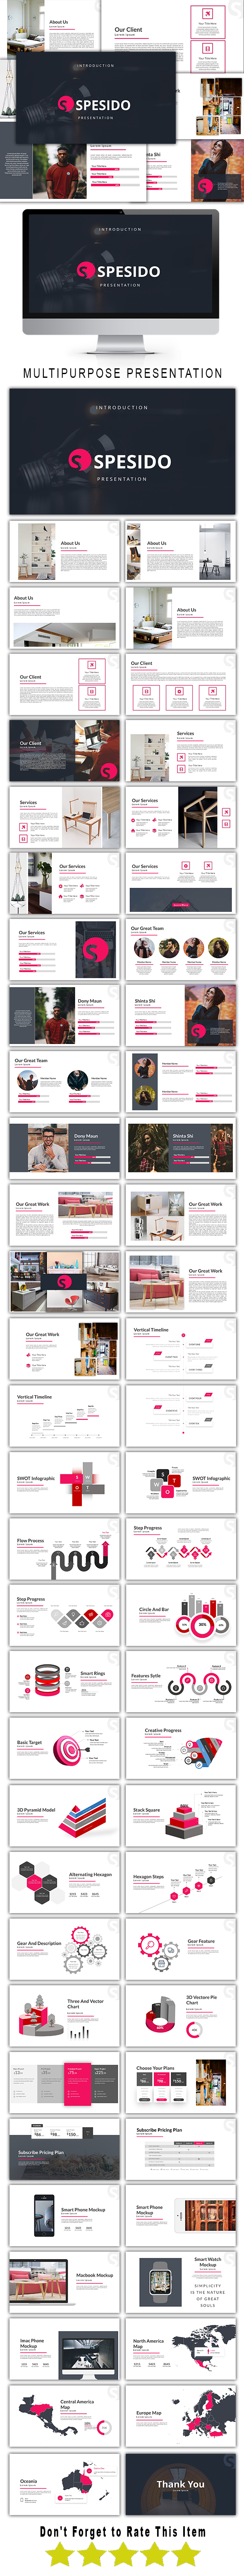 Spesido Multipurpose Google Slide Template - Google Slides Presentation Templates